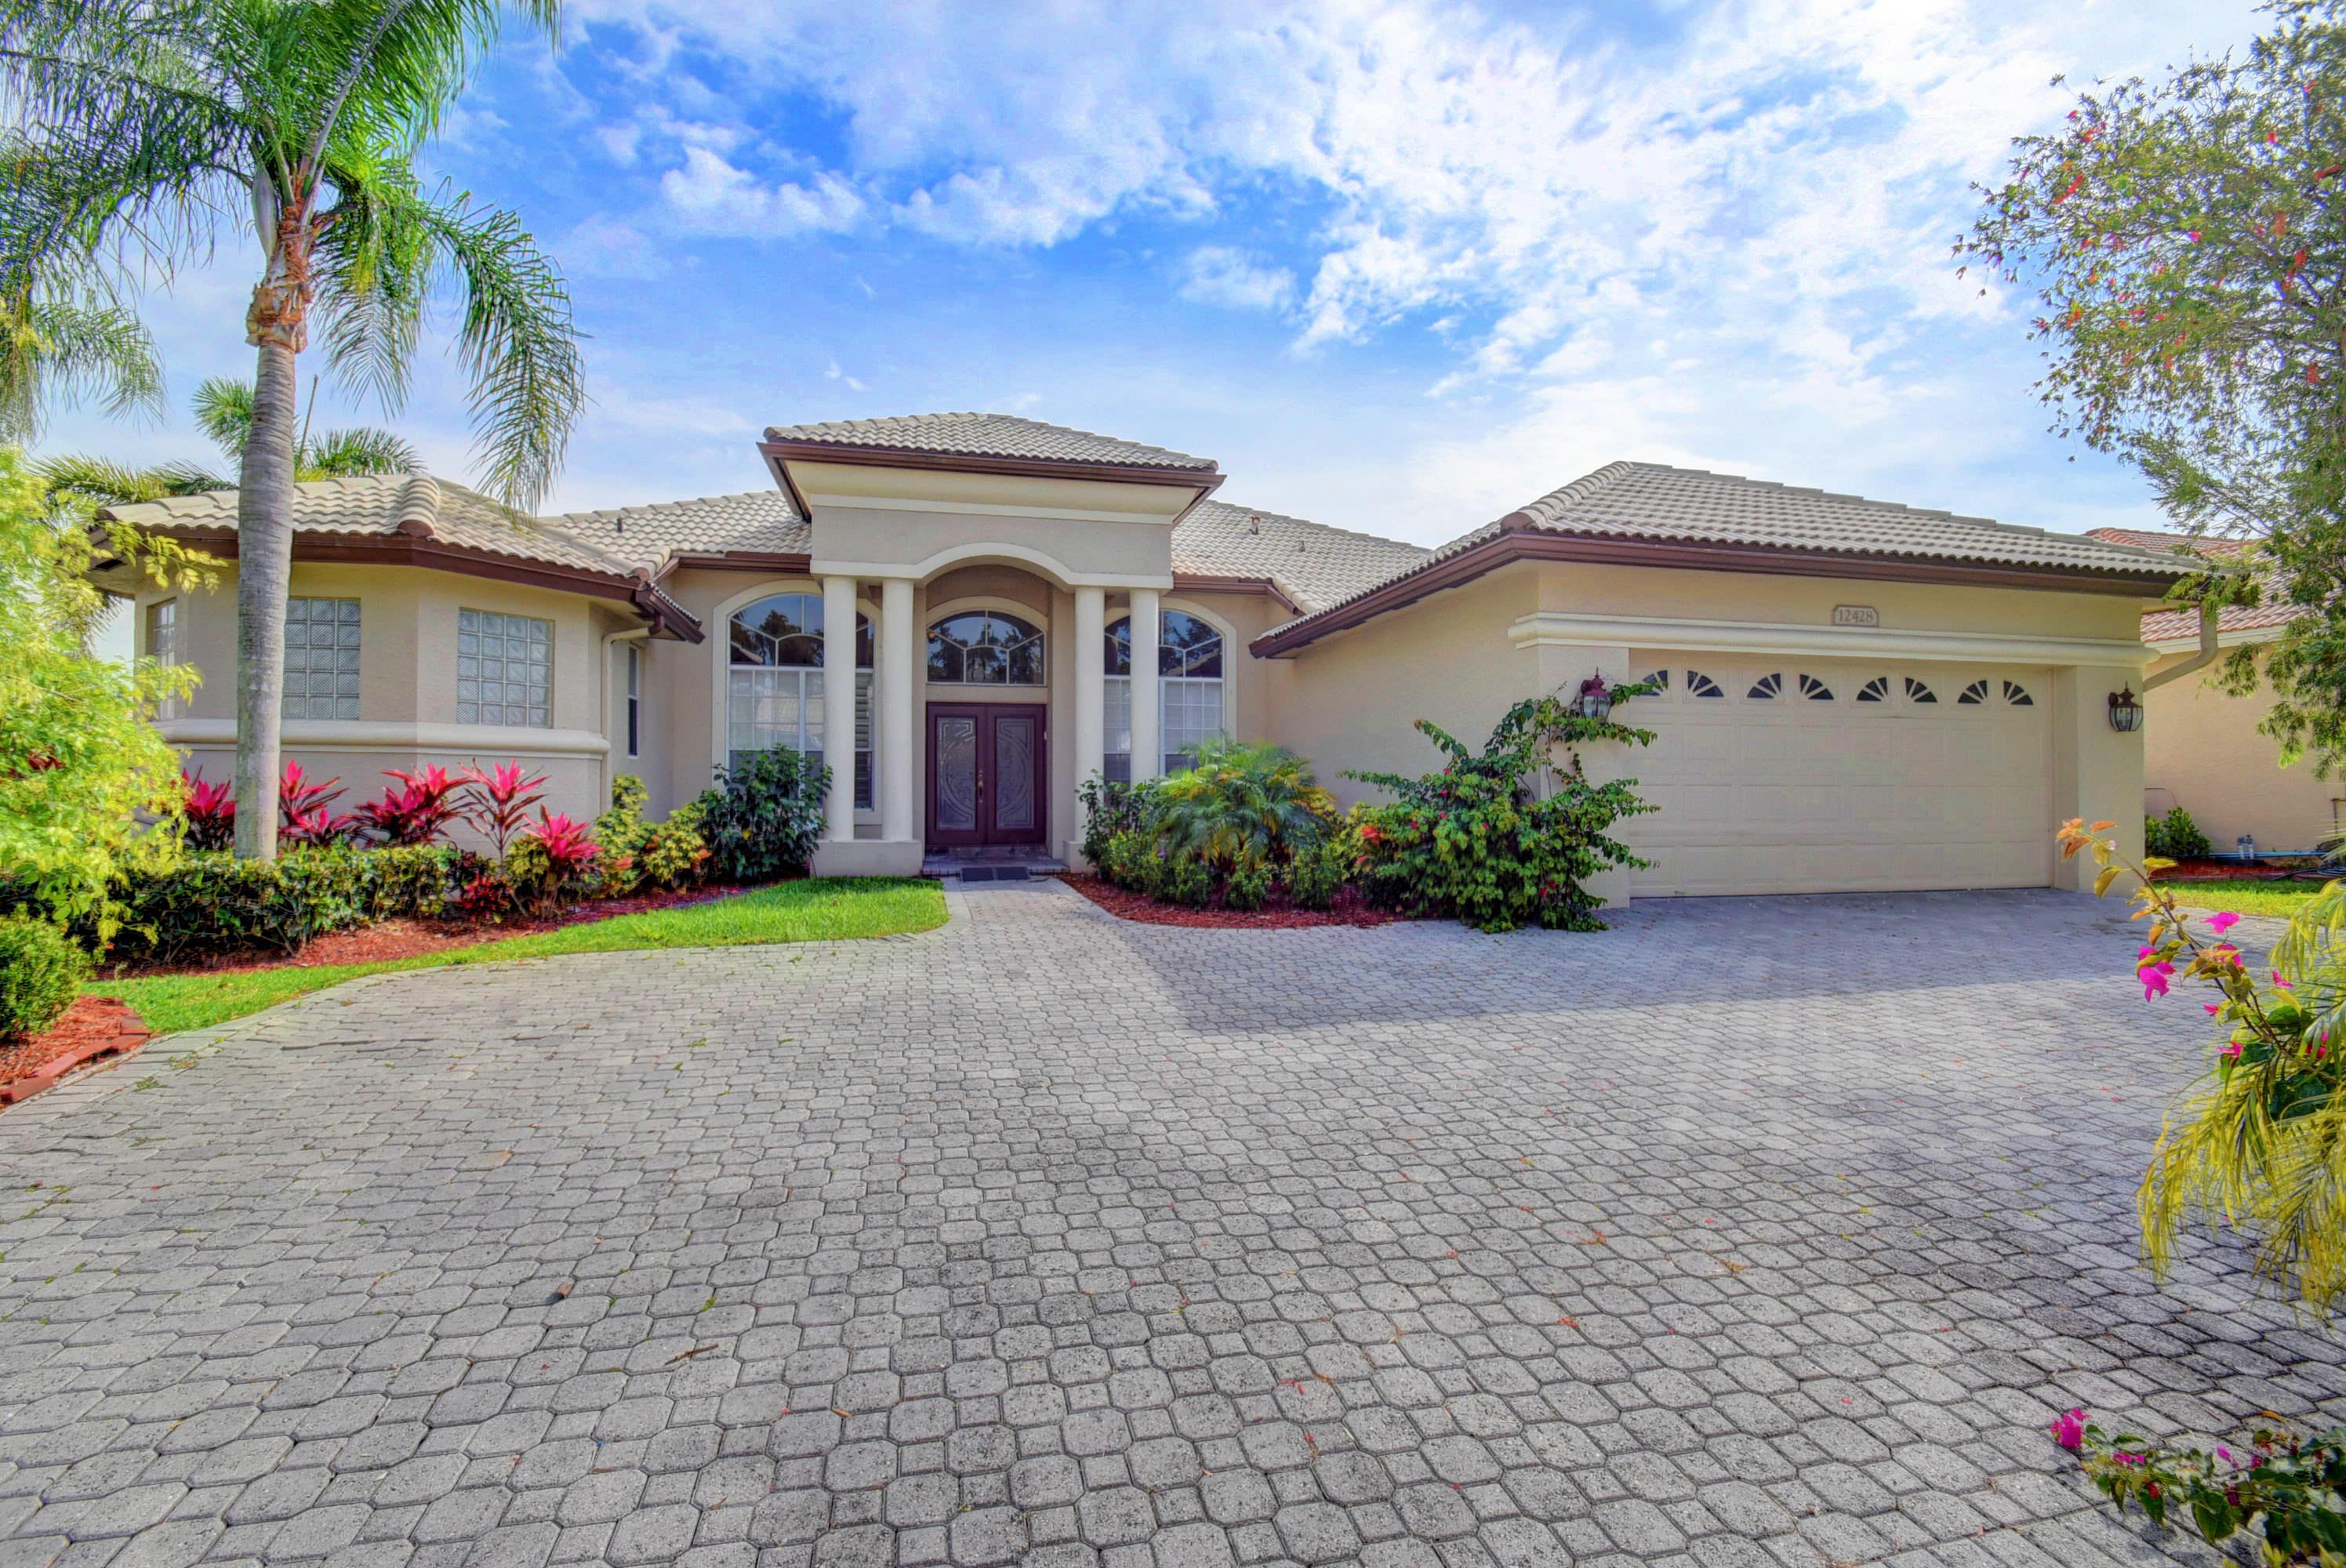 12428 Clearfalls Drive, Boca Raton, FL 33428